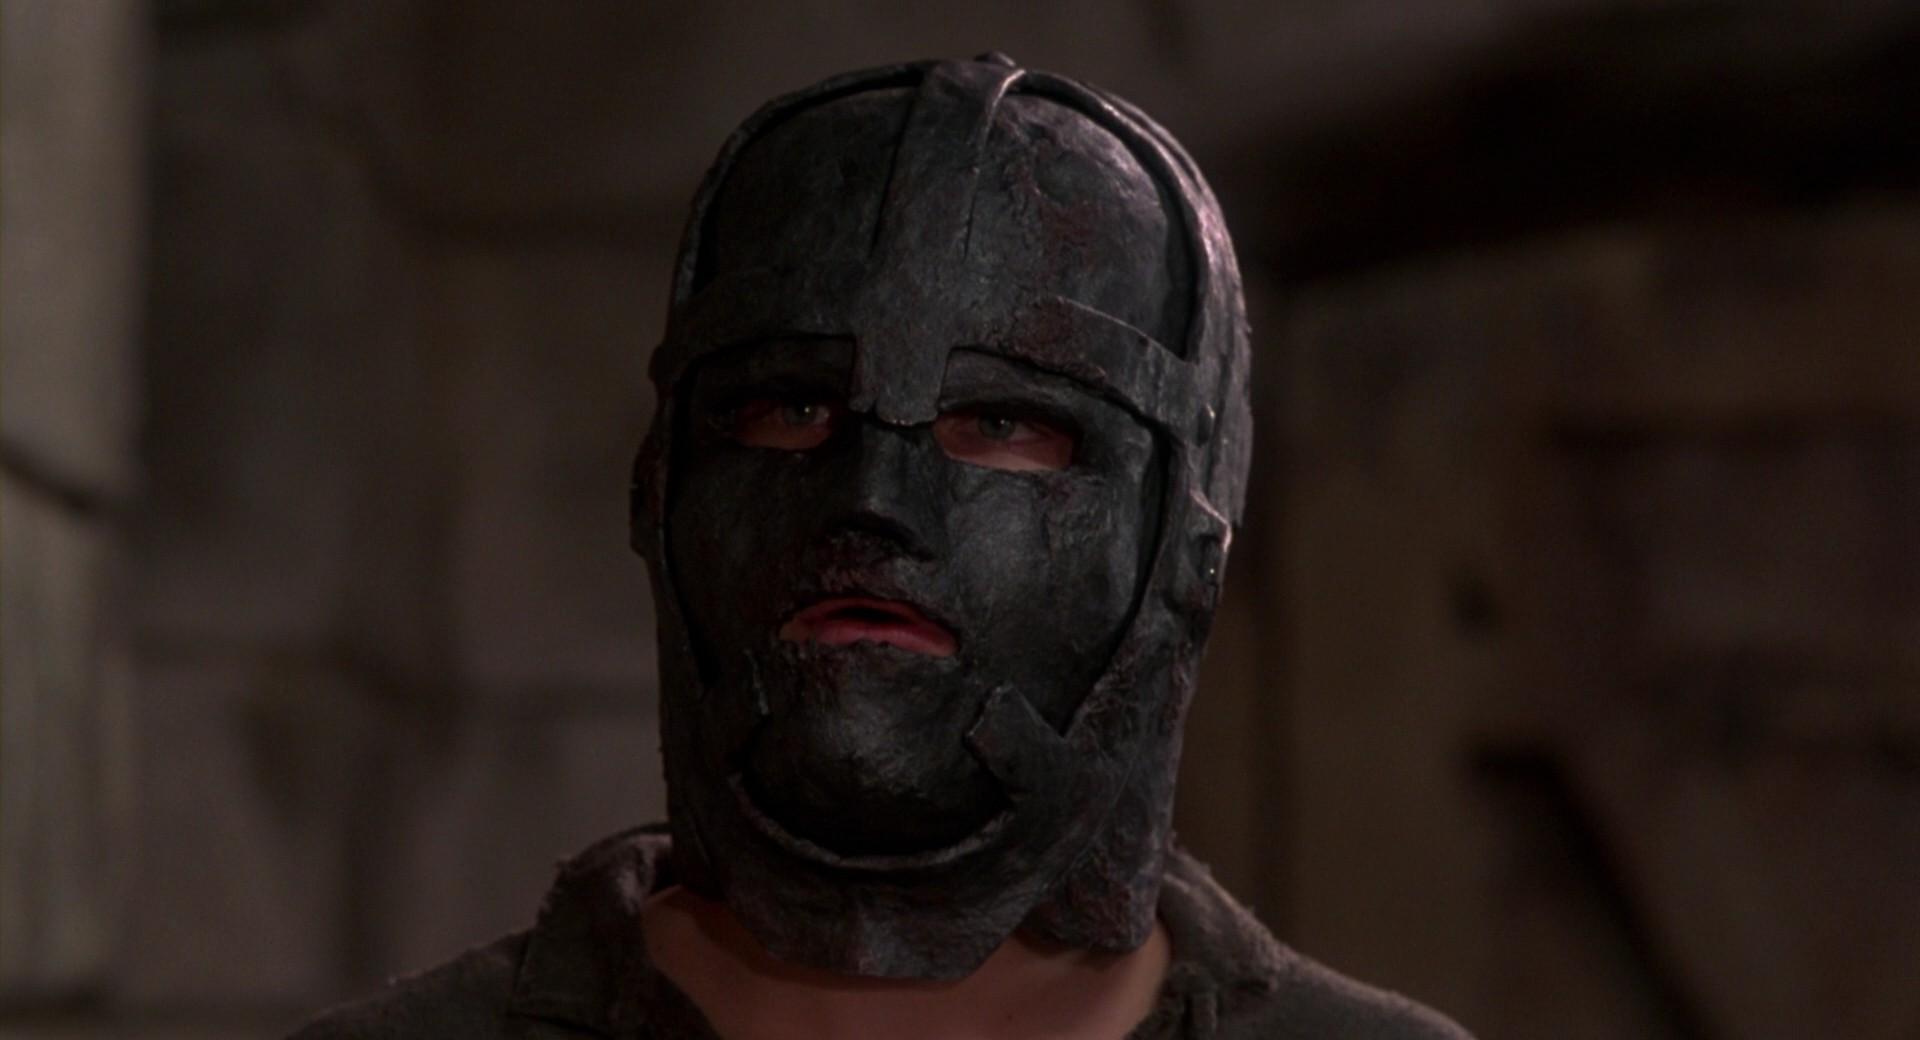 Человек в железной маске / The Man in the Iron Mask (1998) BDRip 1080p